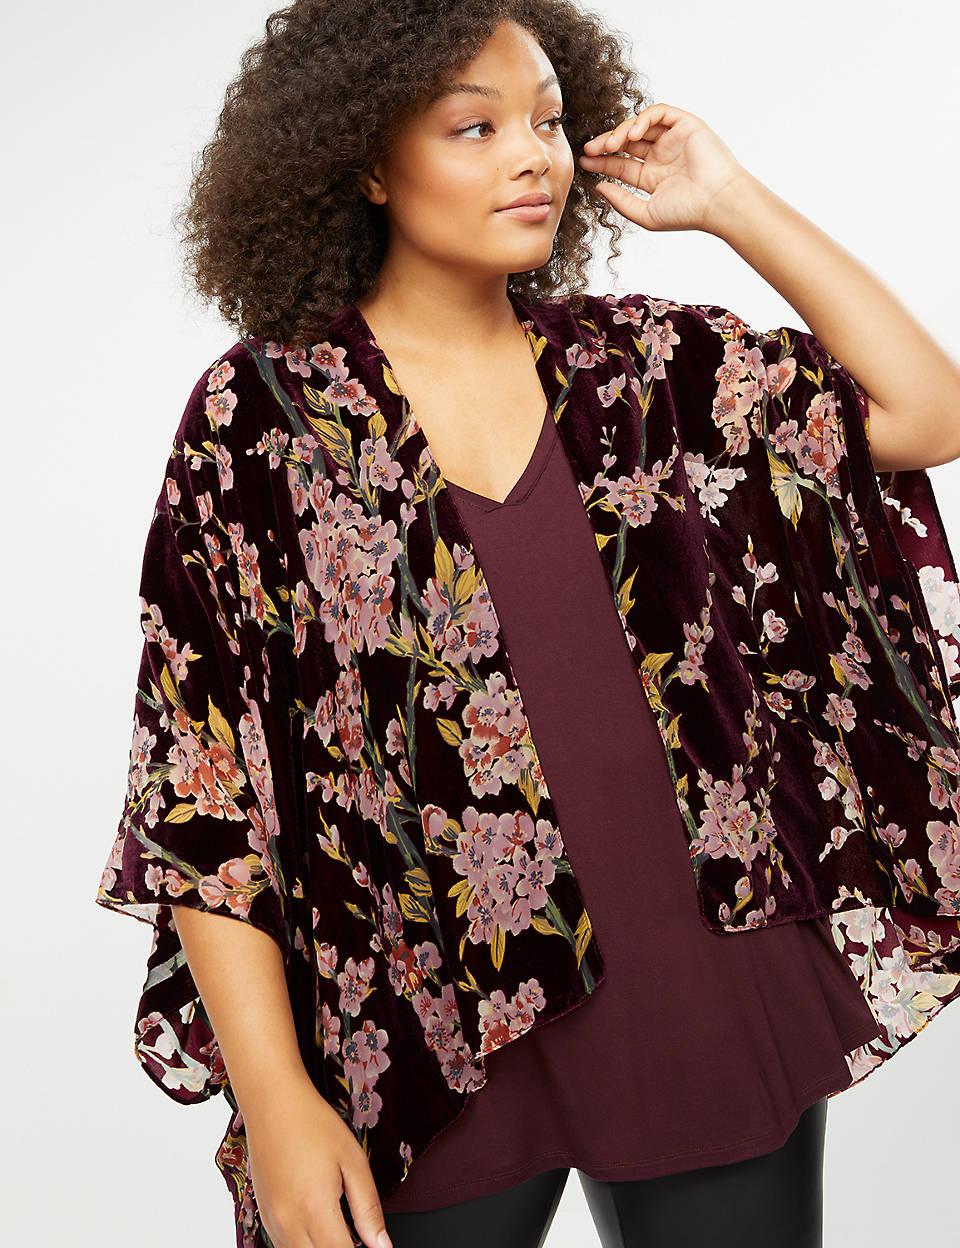 LB velvet kimono